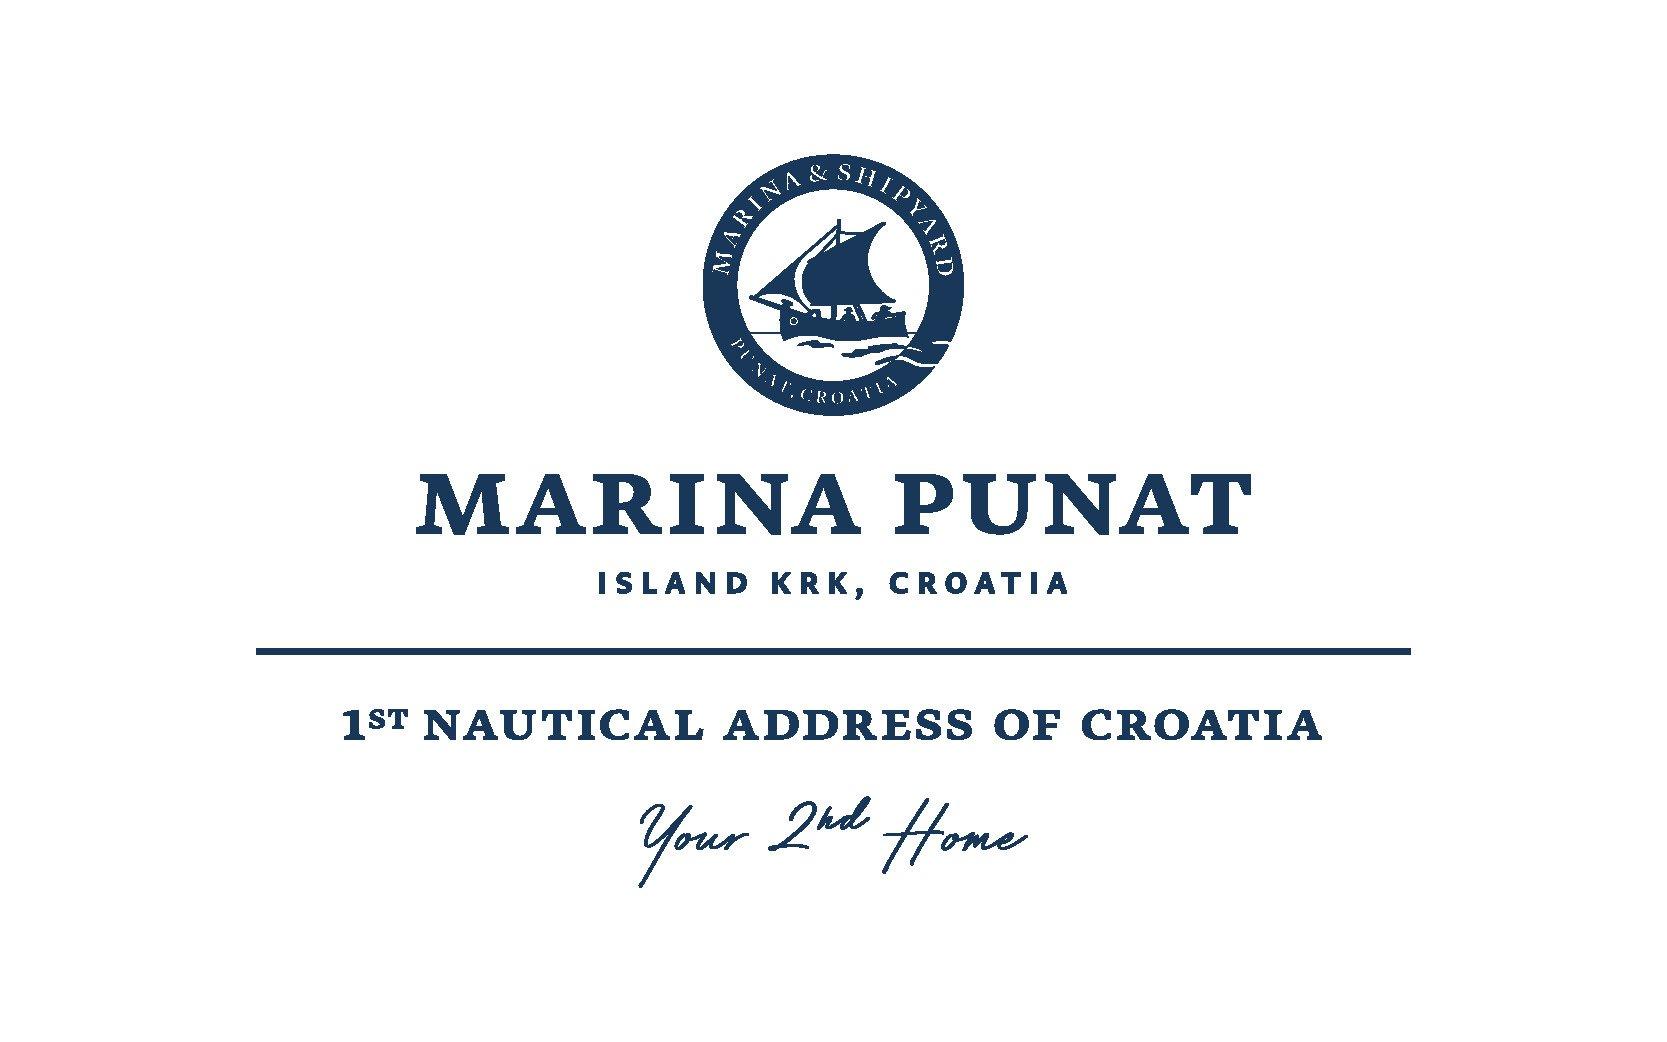 Marina Punat